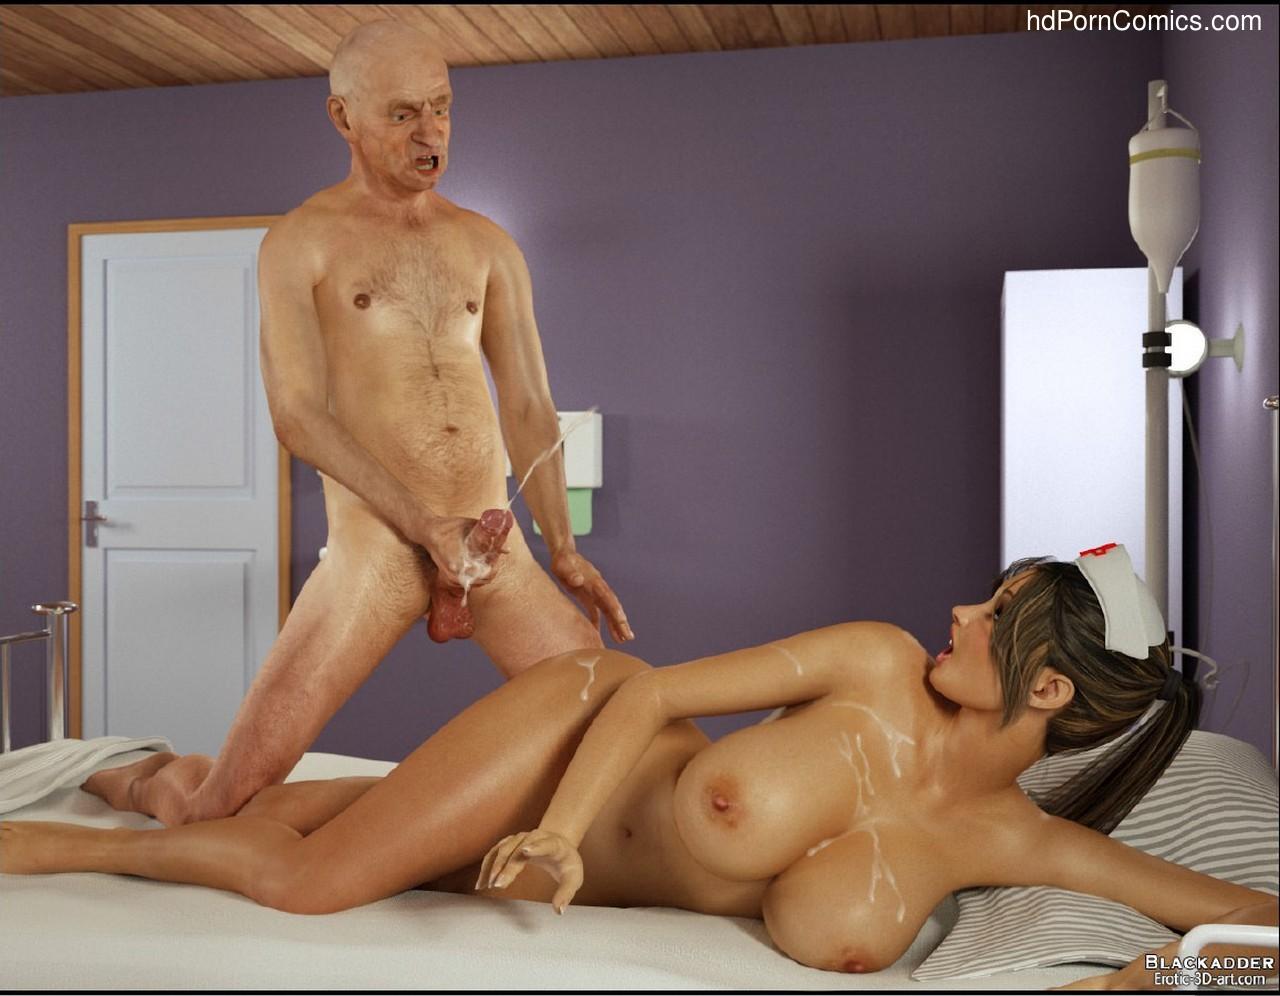 kachestvennie-3d-porno